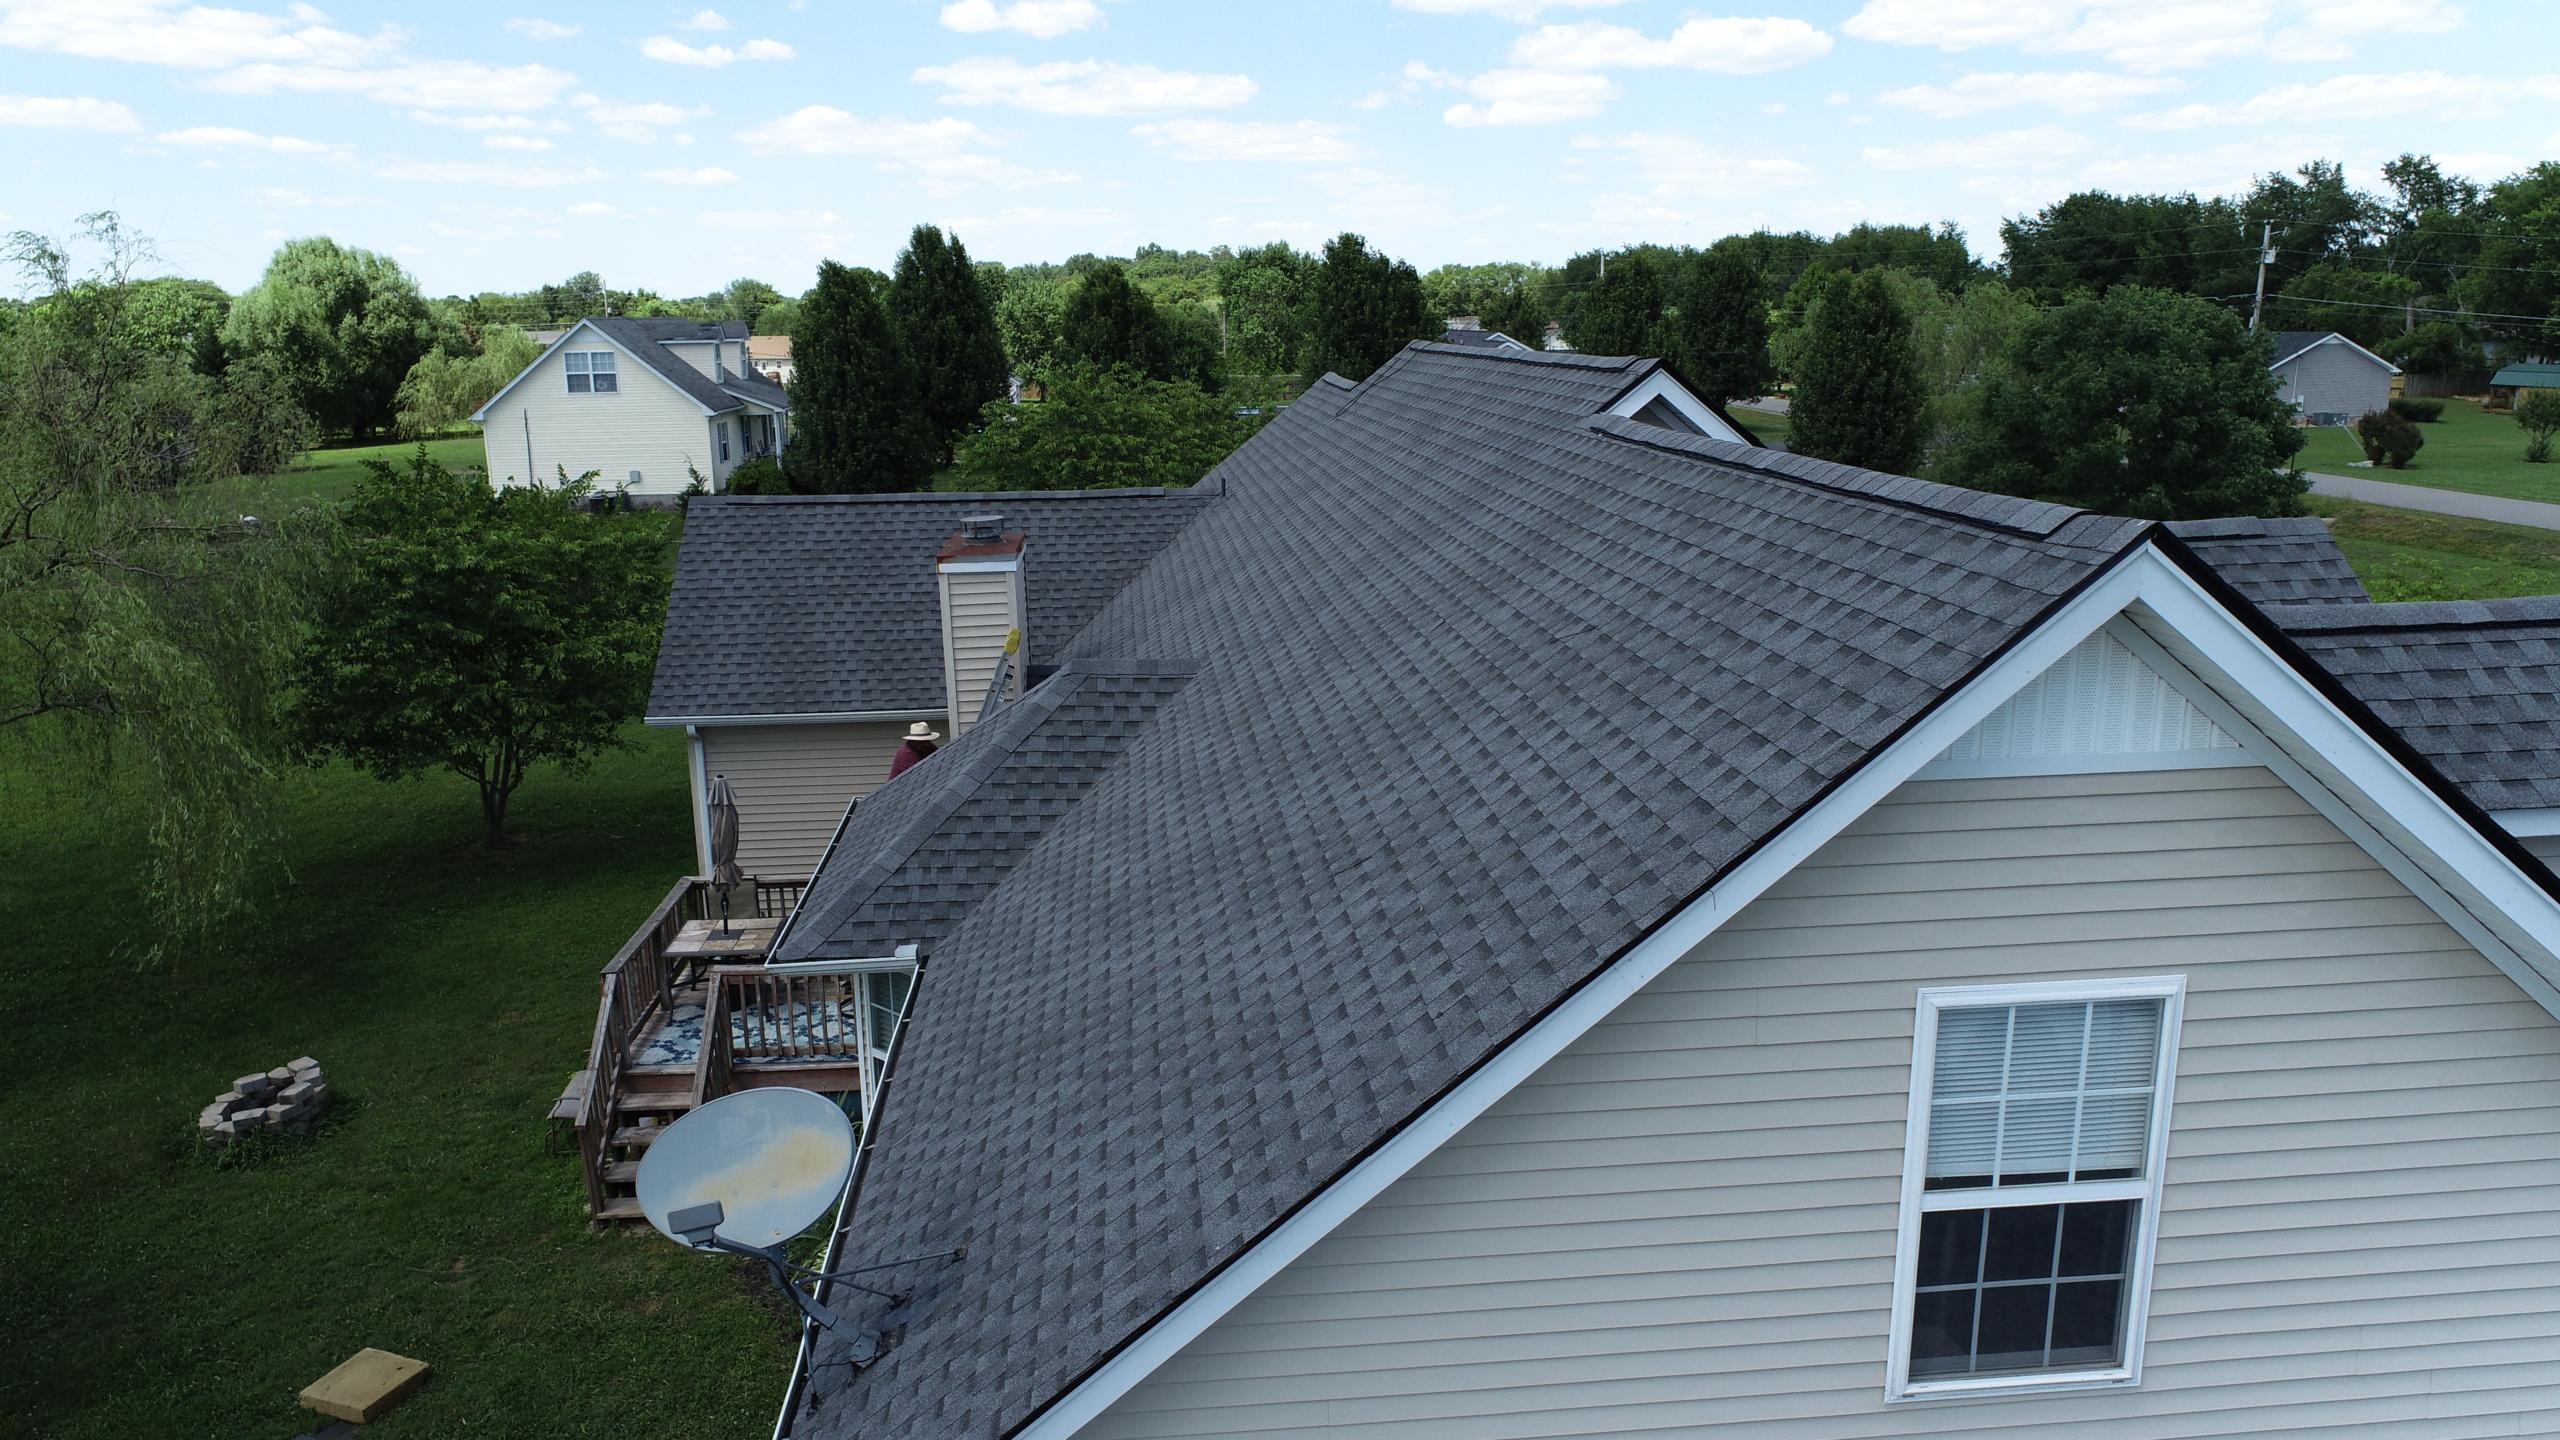 Roofing Murfreesboro GAF Pewter Gray Shingles 1